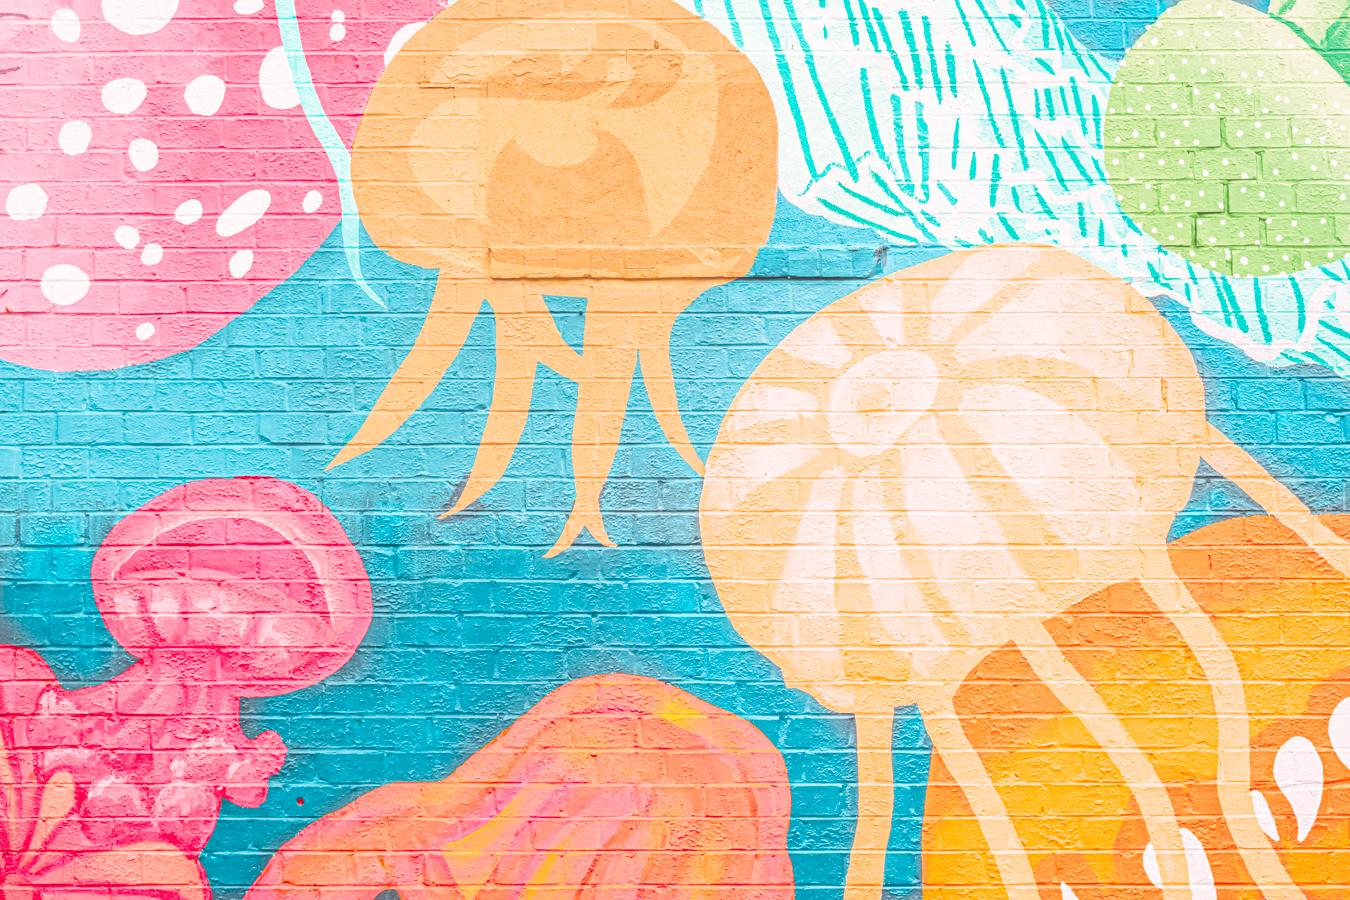 Instagrammable Jellyfish Wall in Jacksonville